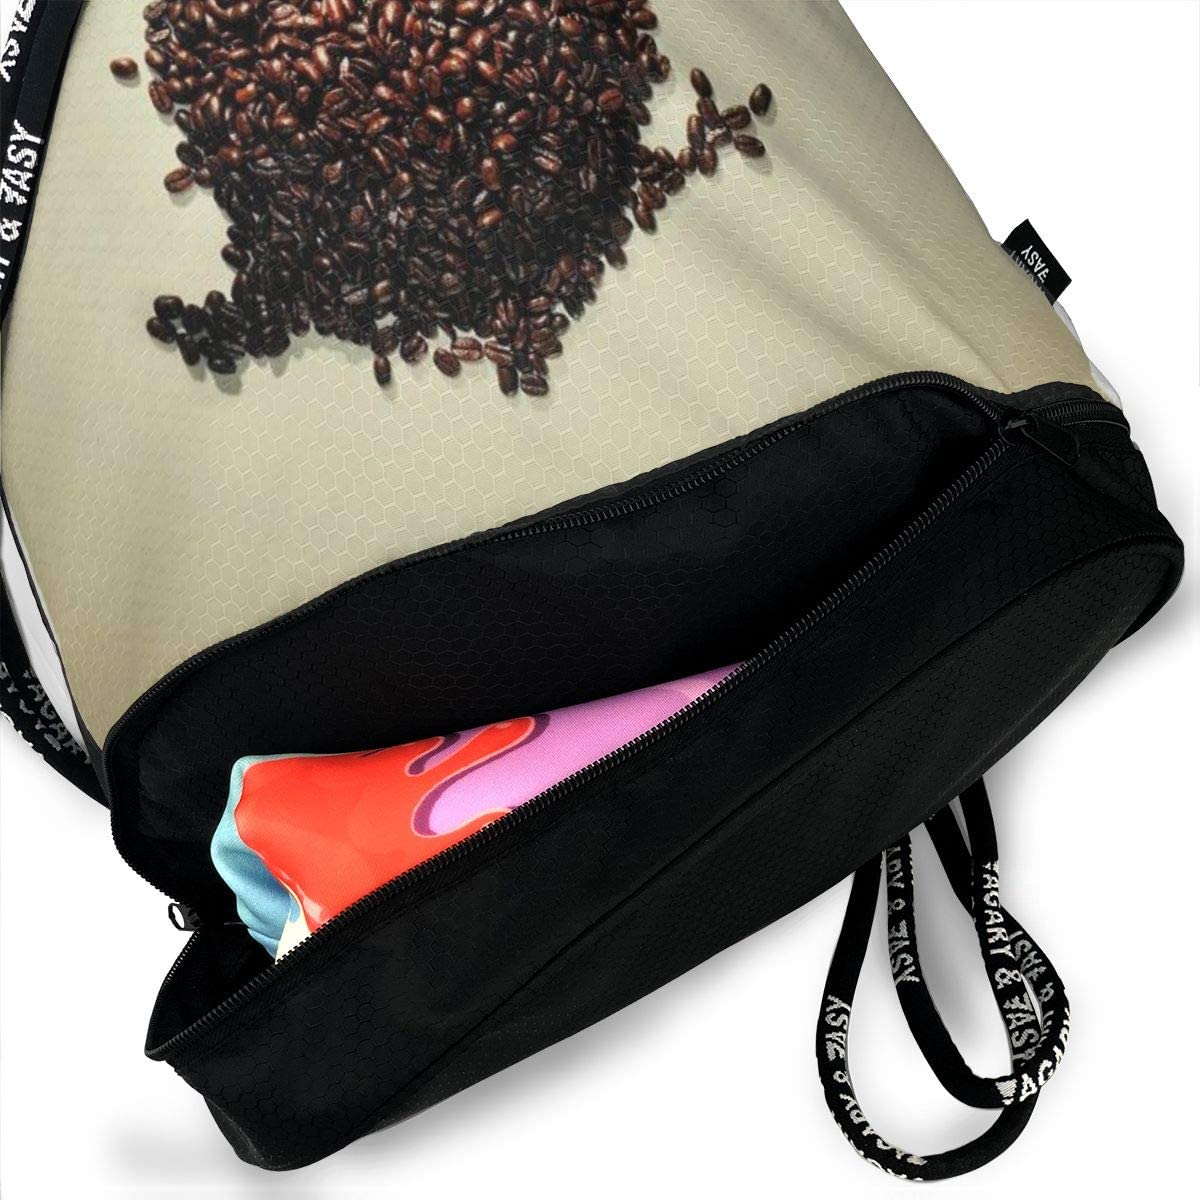 GymSack Drawstring Bag Sackpack Coffee Owl Sport Cinch Pack Simple Bundle Pocke Backpack For Men Women